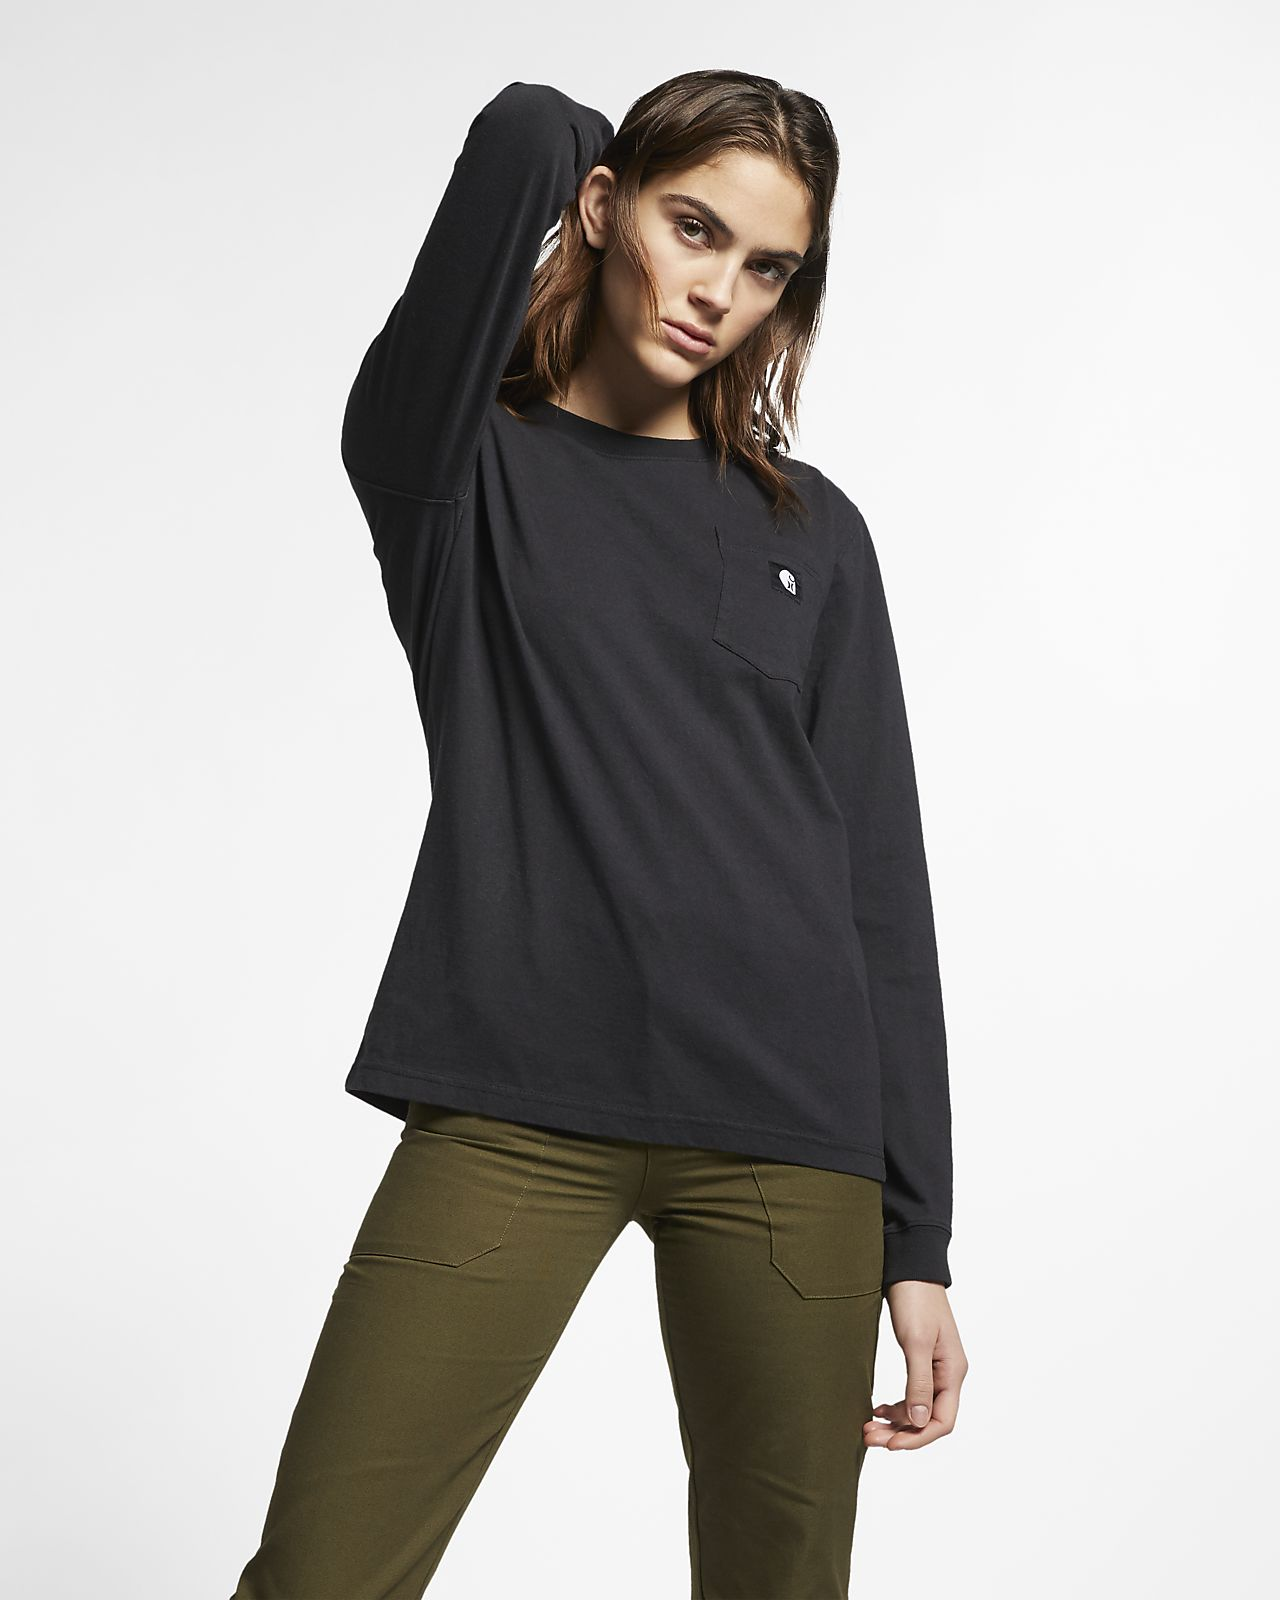 Hurley x Carhartt Women's Long Sleeve Top